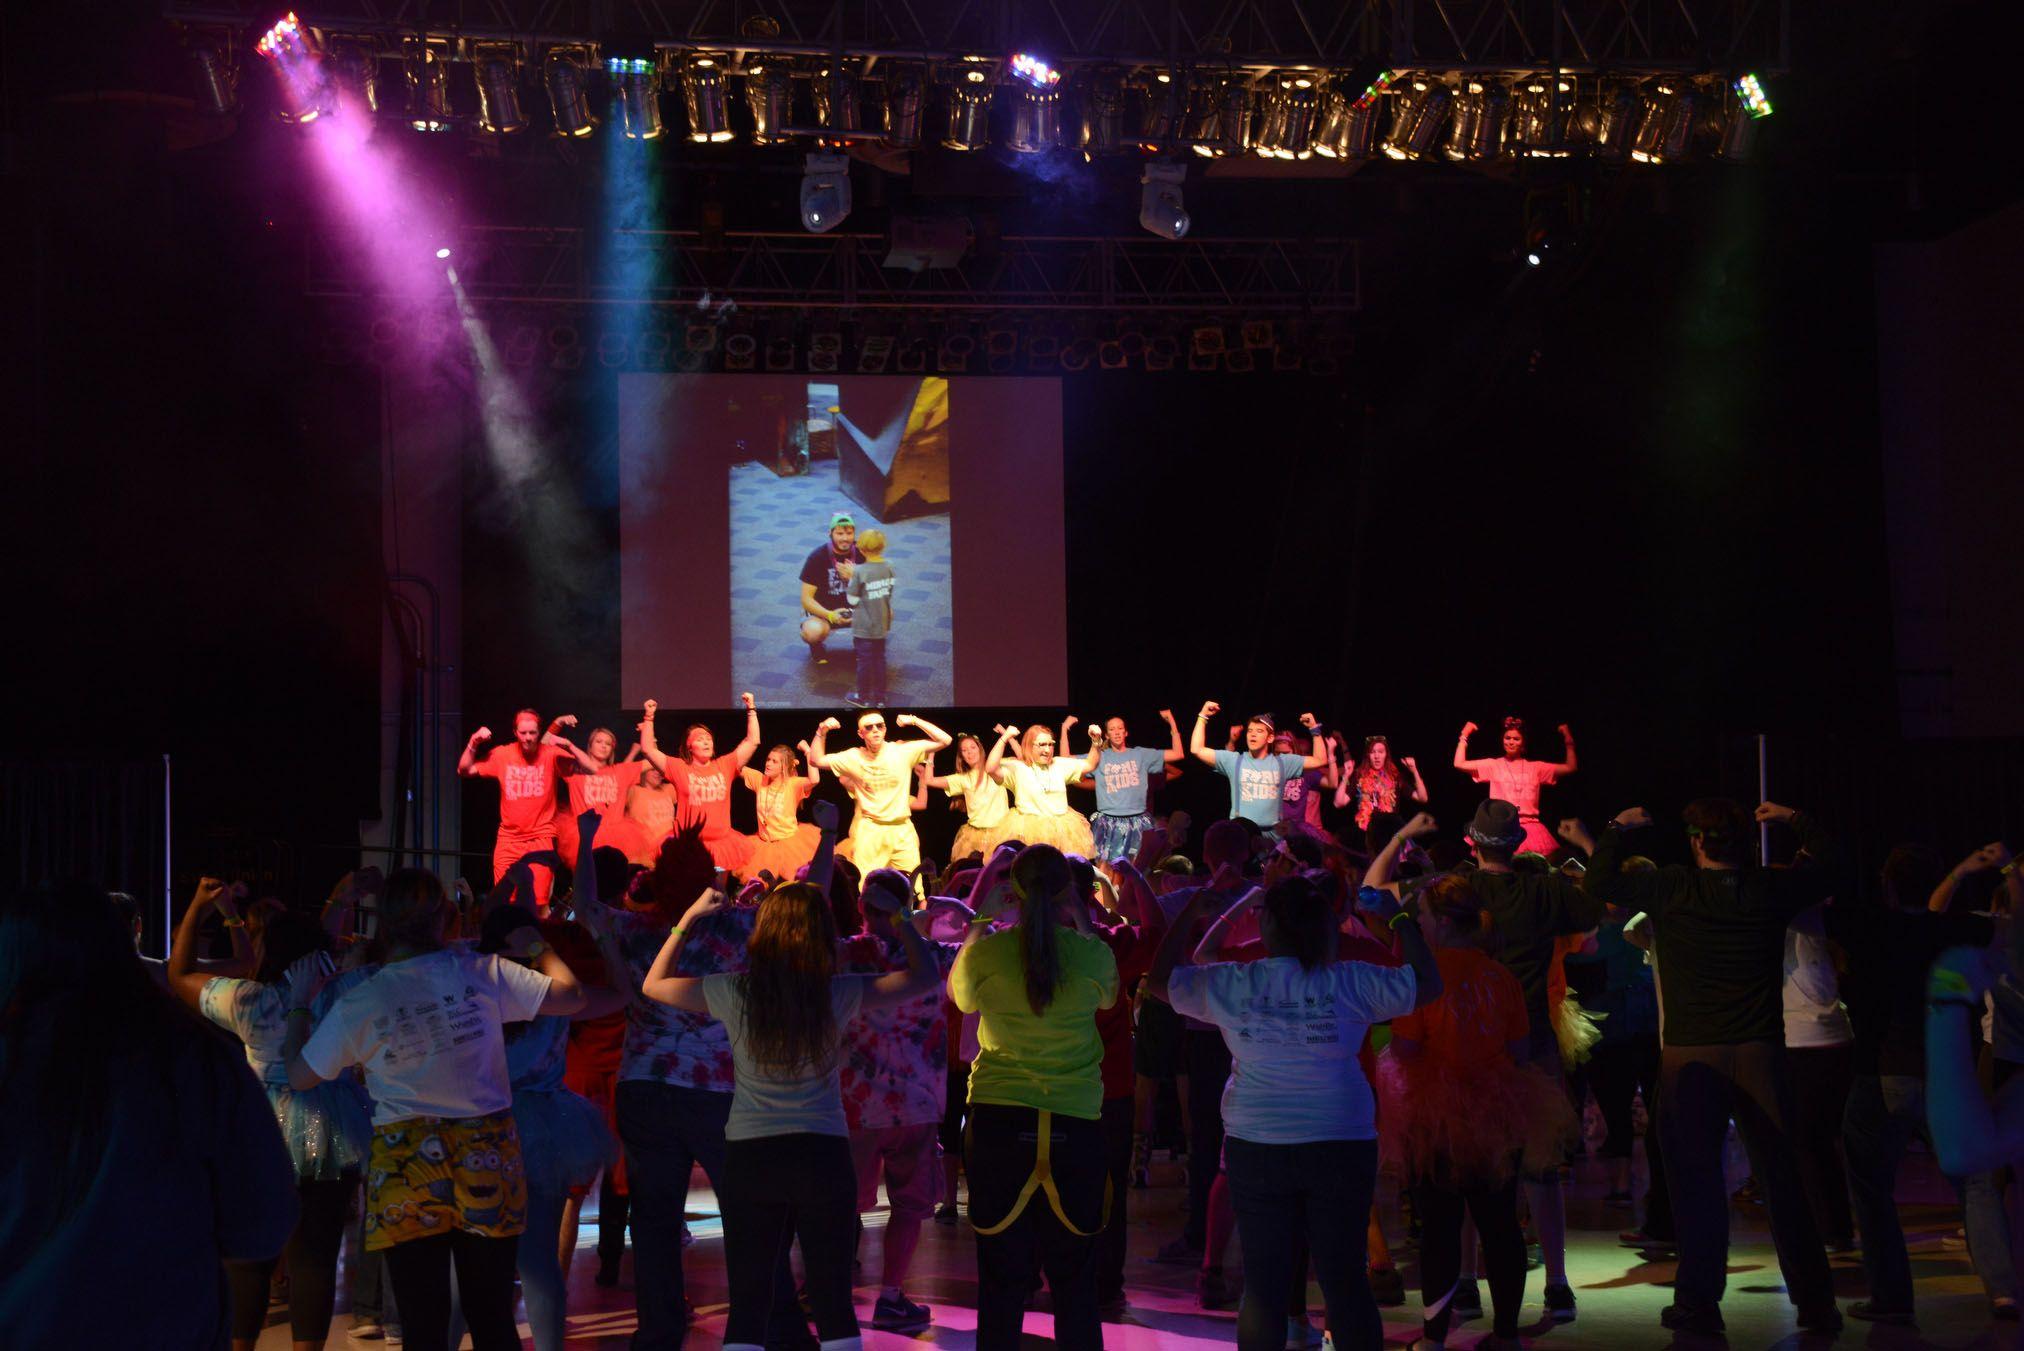 The second annual Raiderthon dance marathon was a success! Students raised over $61,000 for Dayton Children's Hospital.